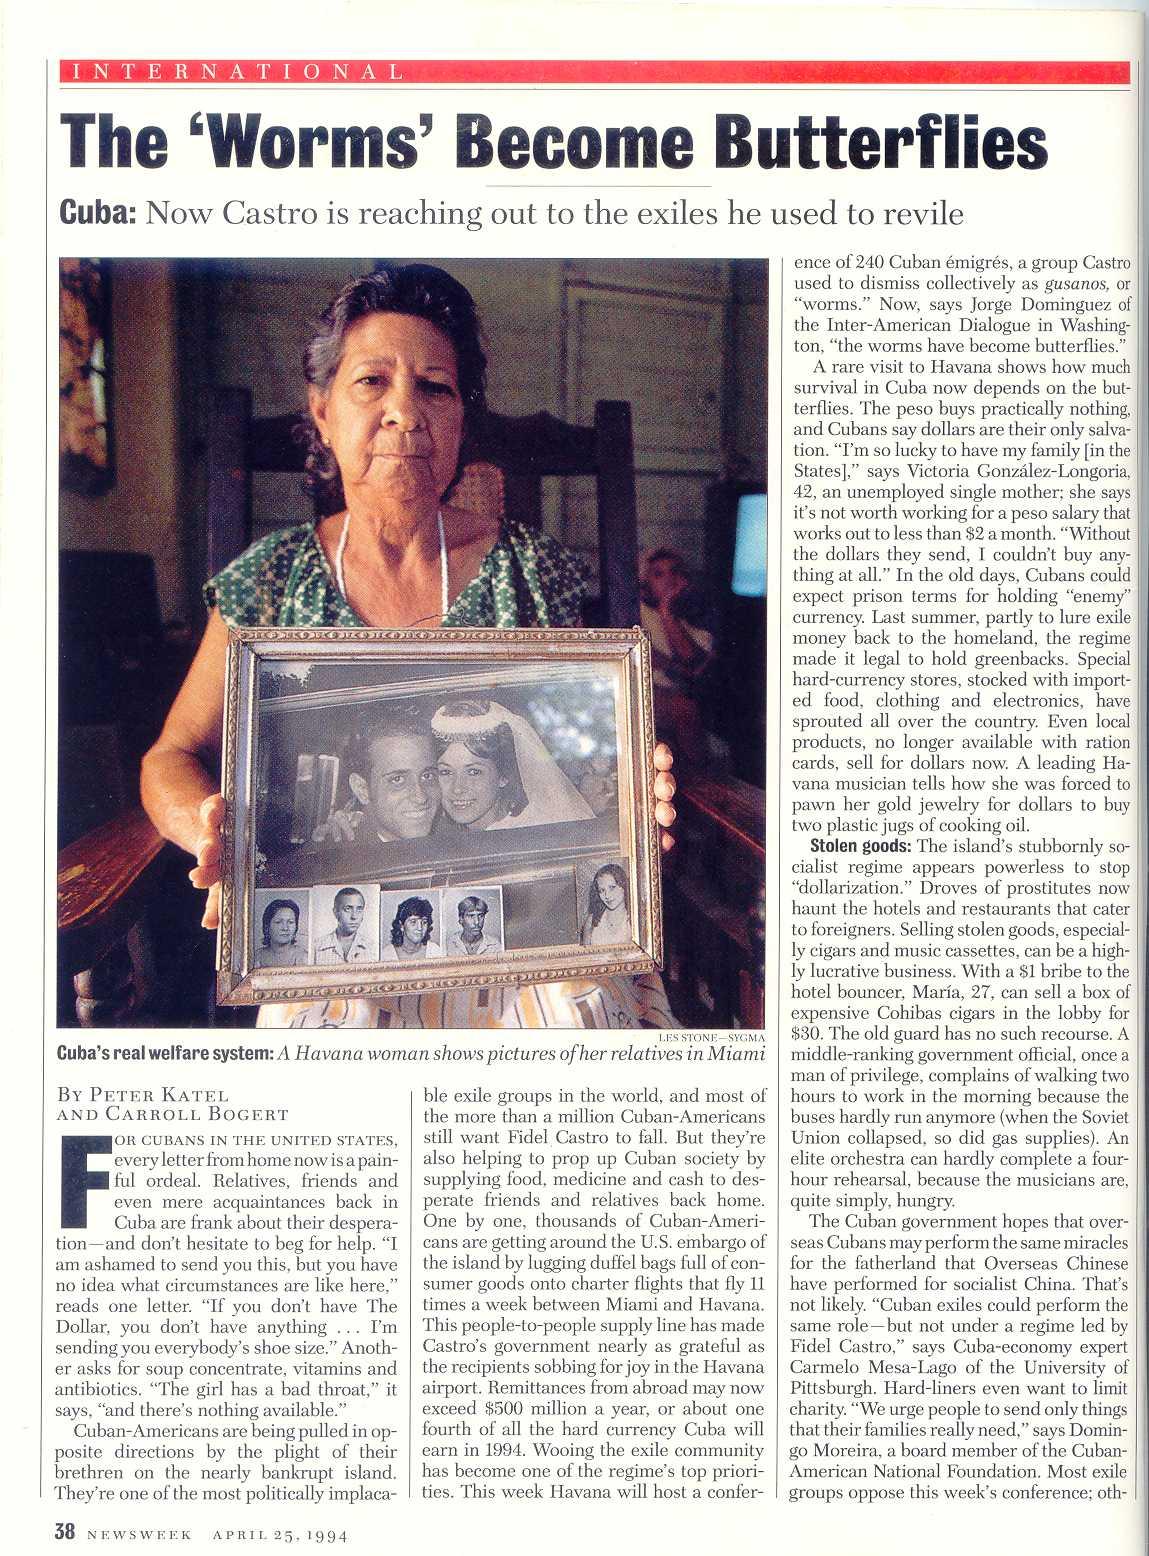 Peter Katel in Havana, Cuba – NEWSWEEK Magazine (1994)